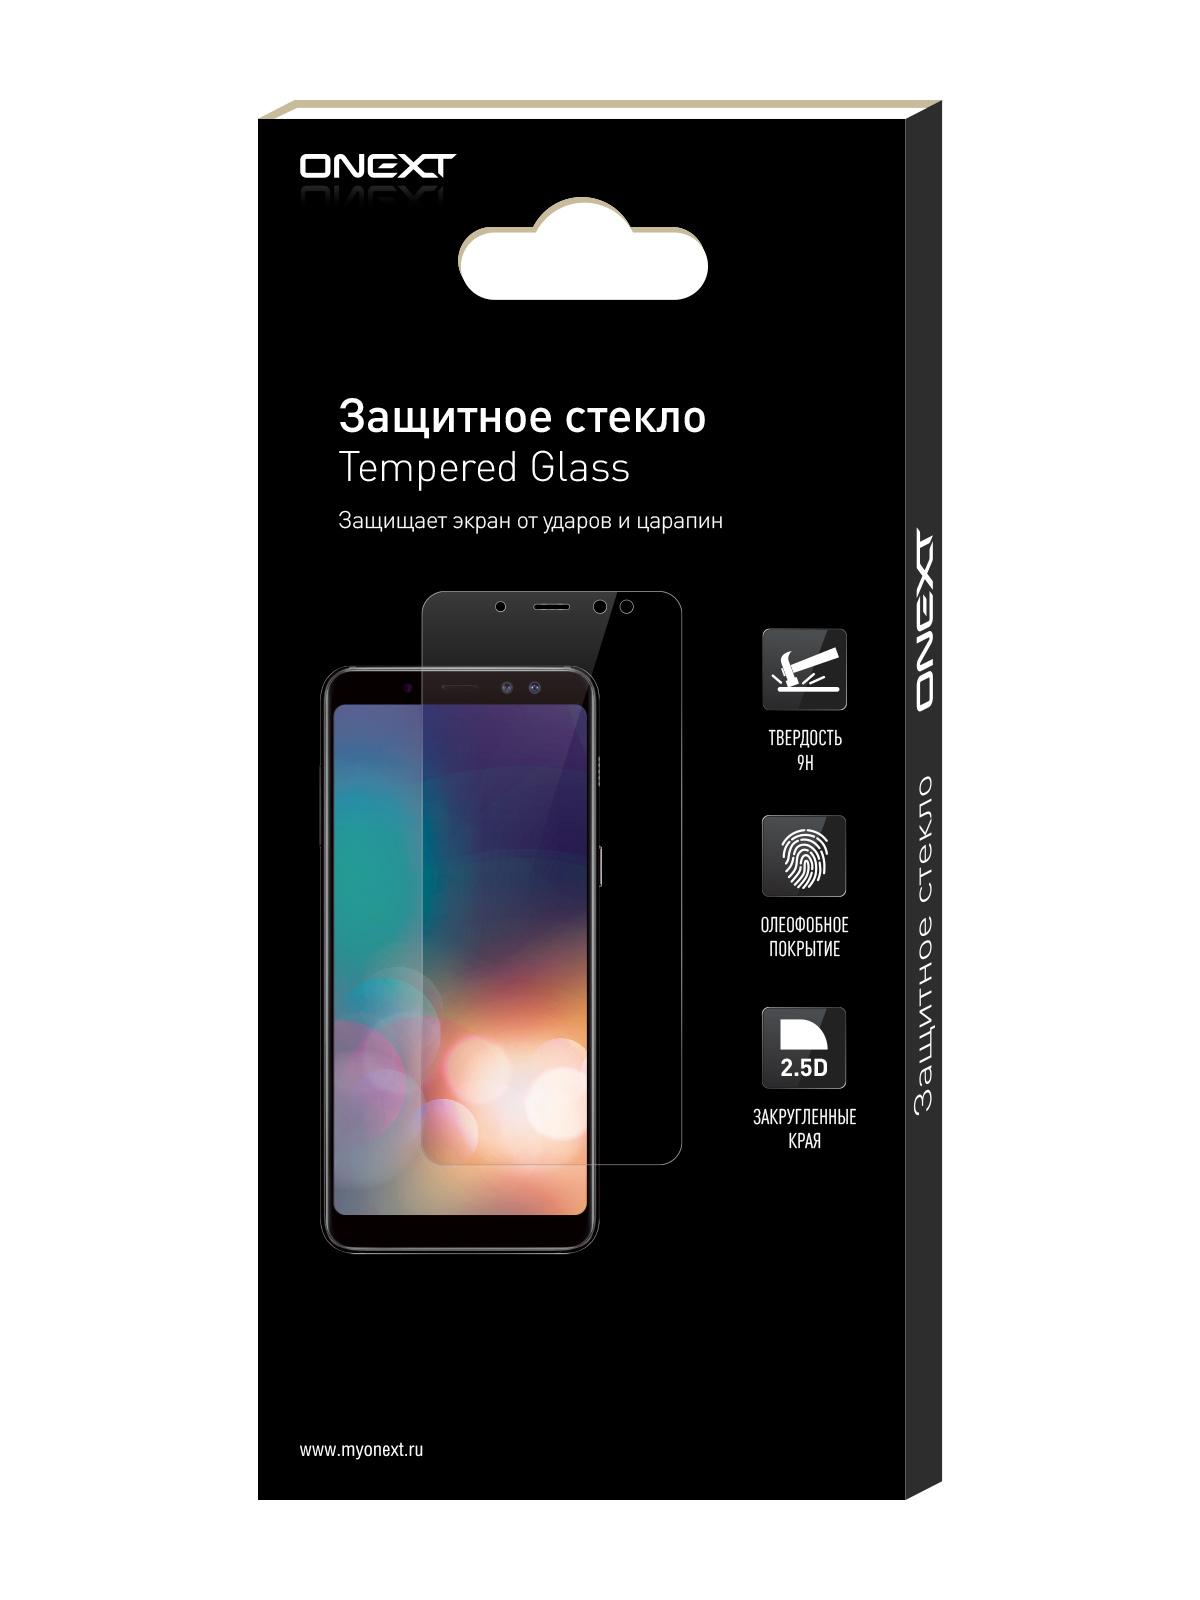 Защитное стекло ONEXT для Samsung Galaxy A8/Galaxy A9